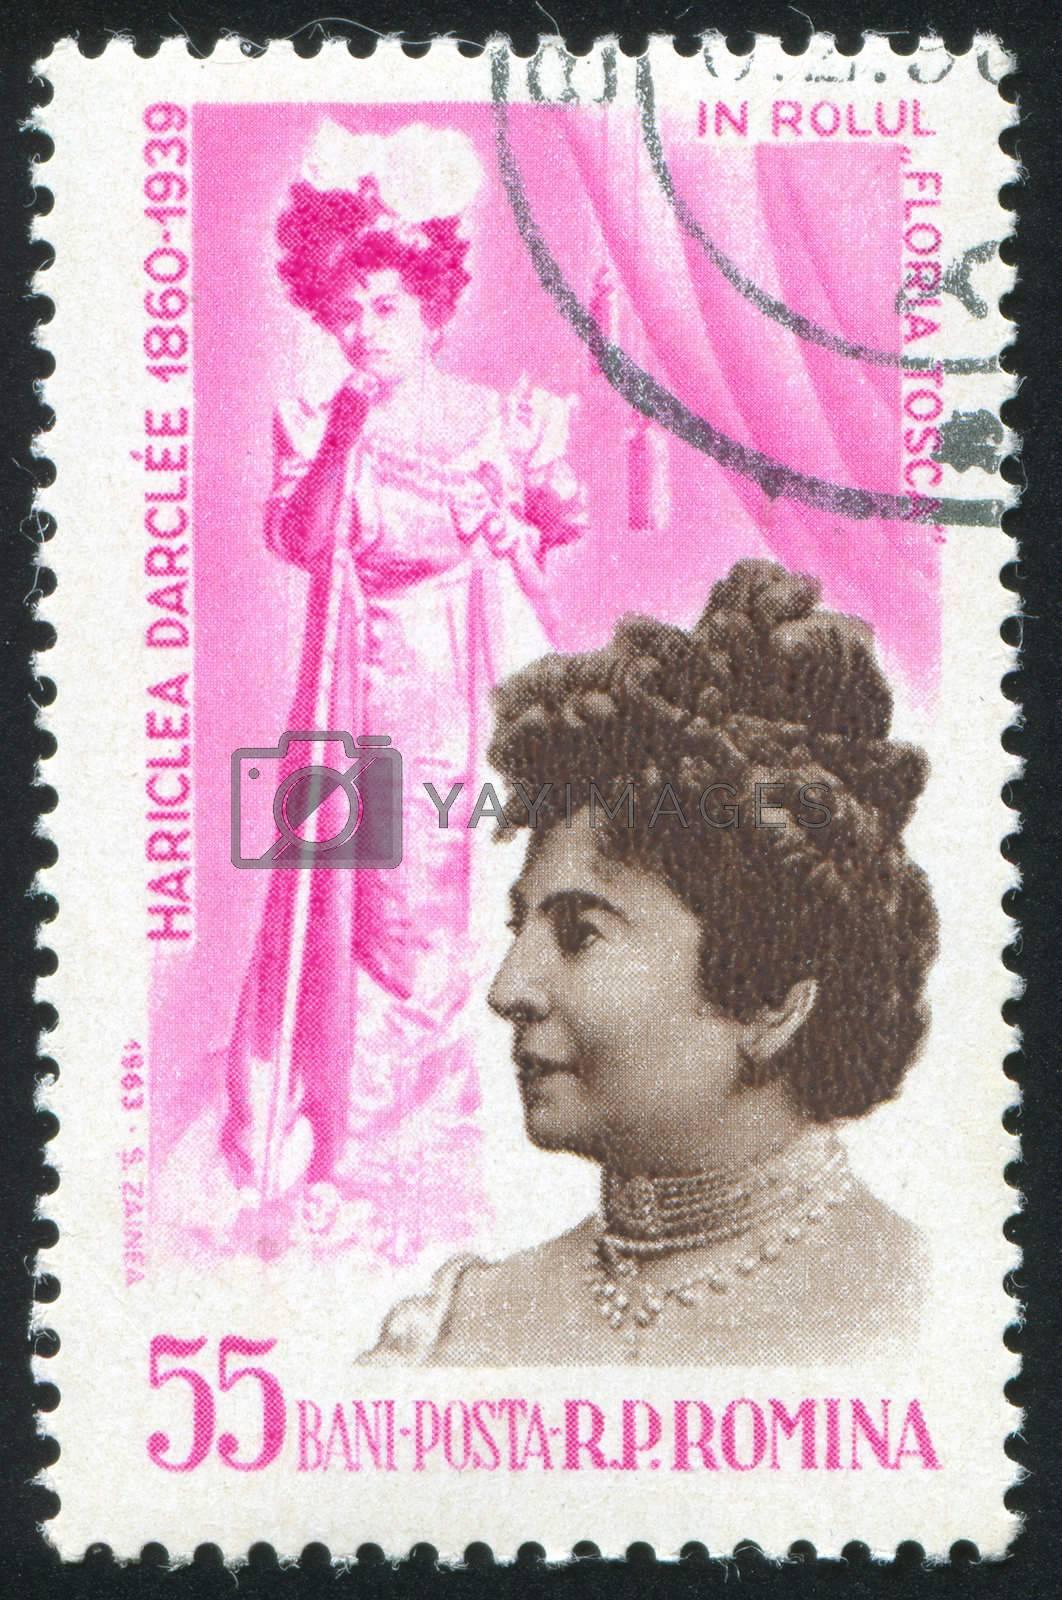 ROMANIA - CIRCA 1963: stamp printed by Romania, show Hariclea Darclee as Tosca, circa 1963.